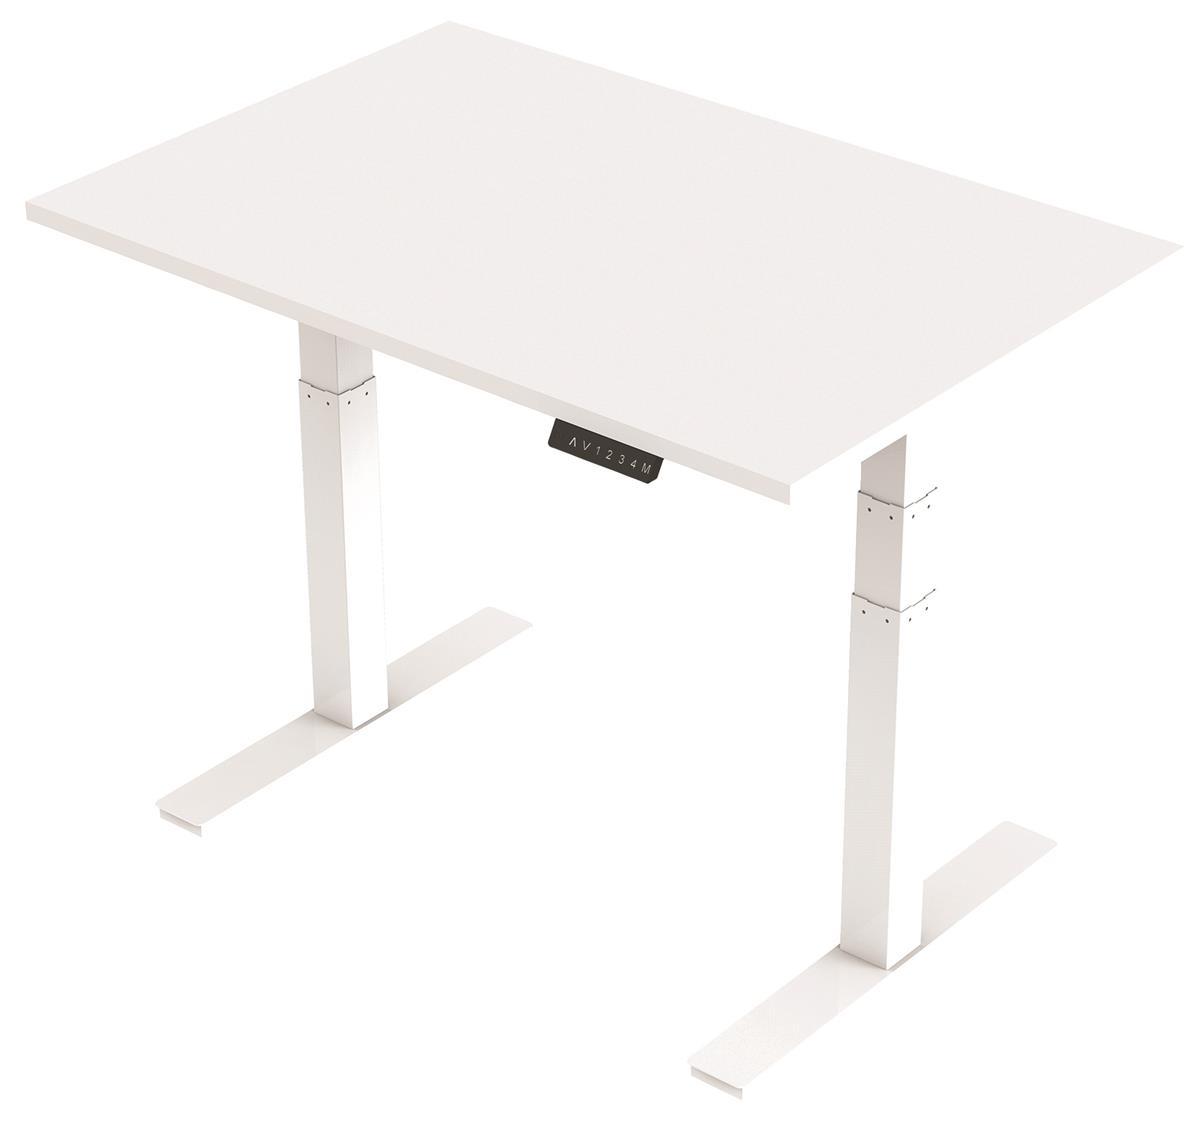 Image for Trexus Sit Stand Desk Height-adjustable White Leg Frame 1200mm White